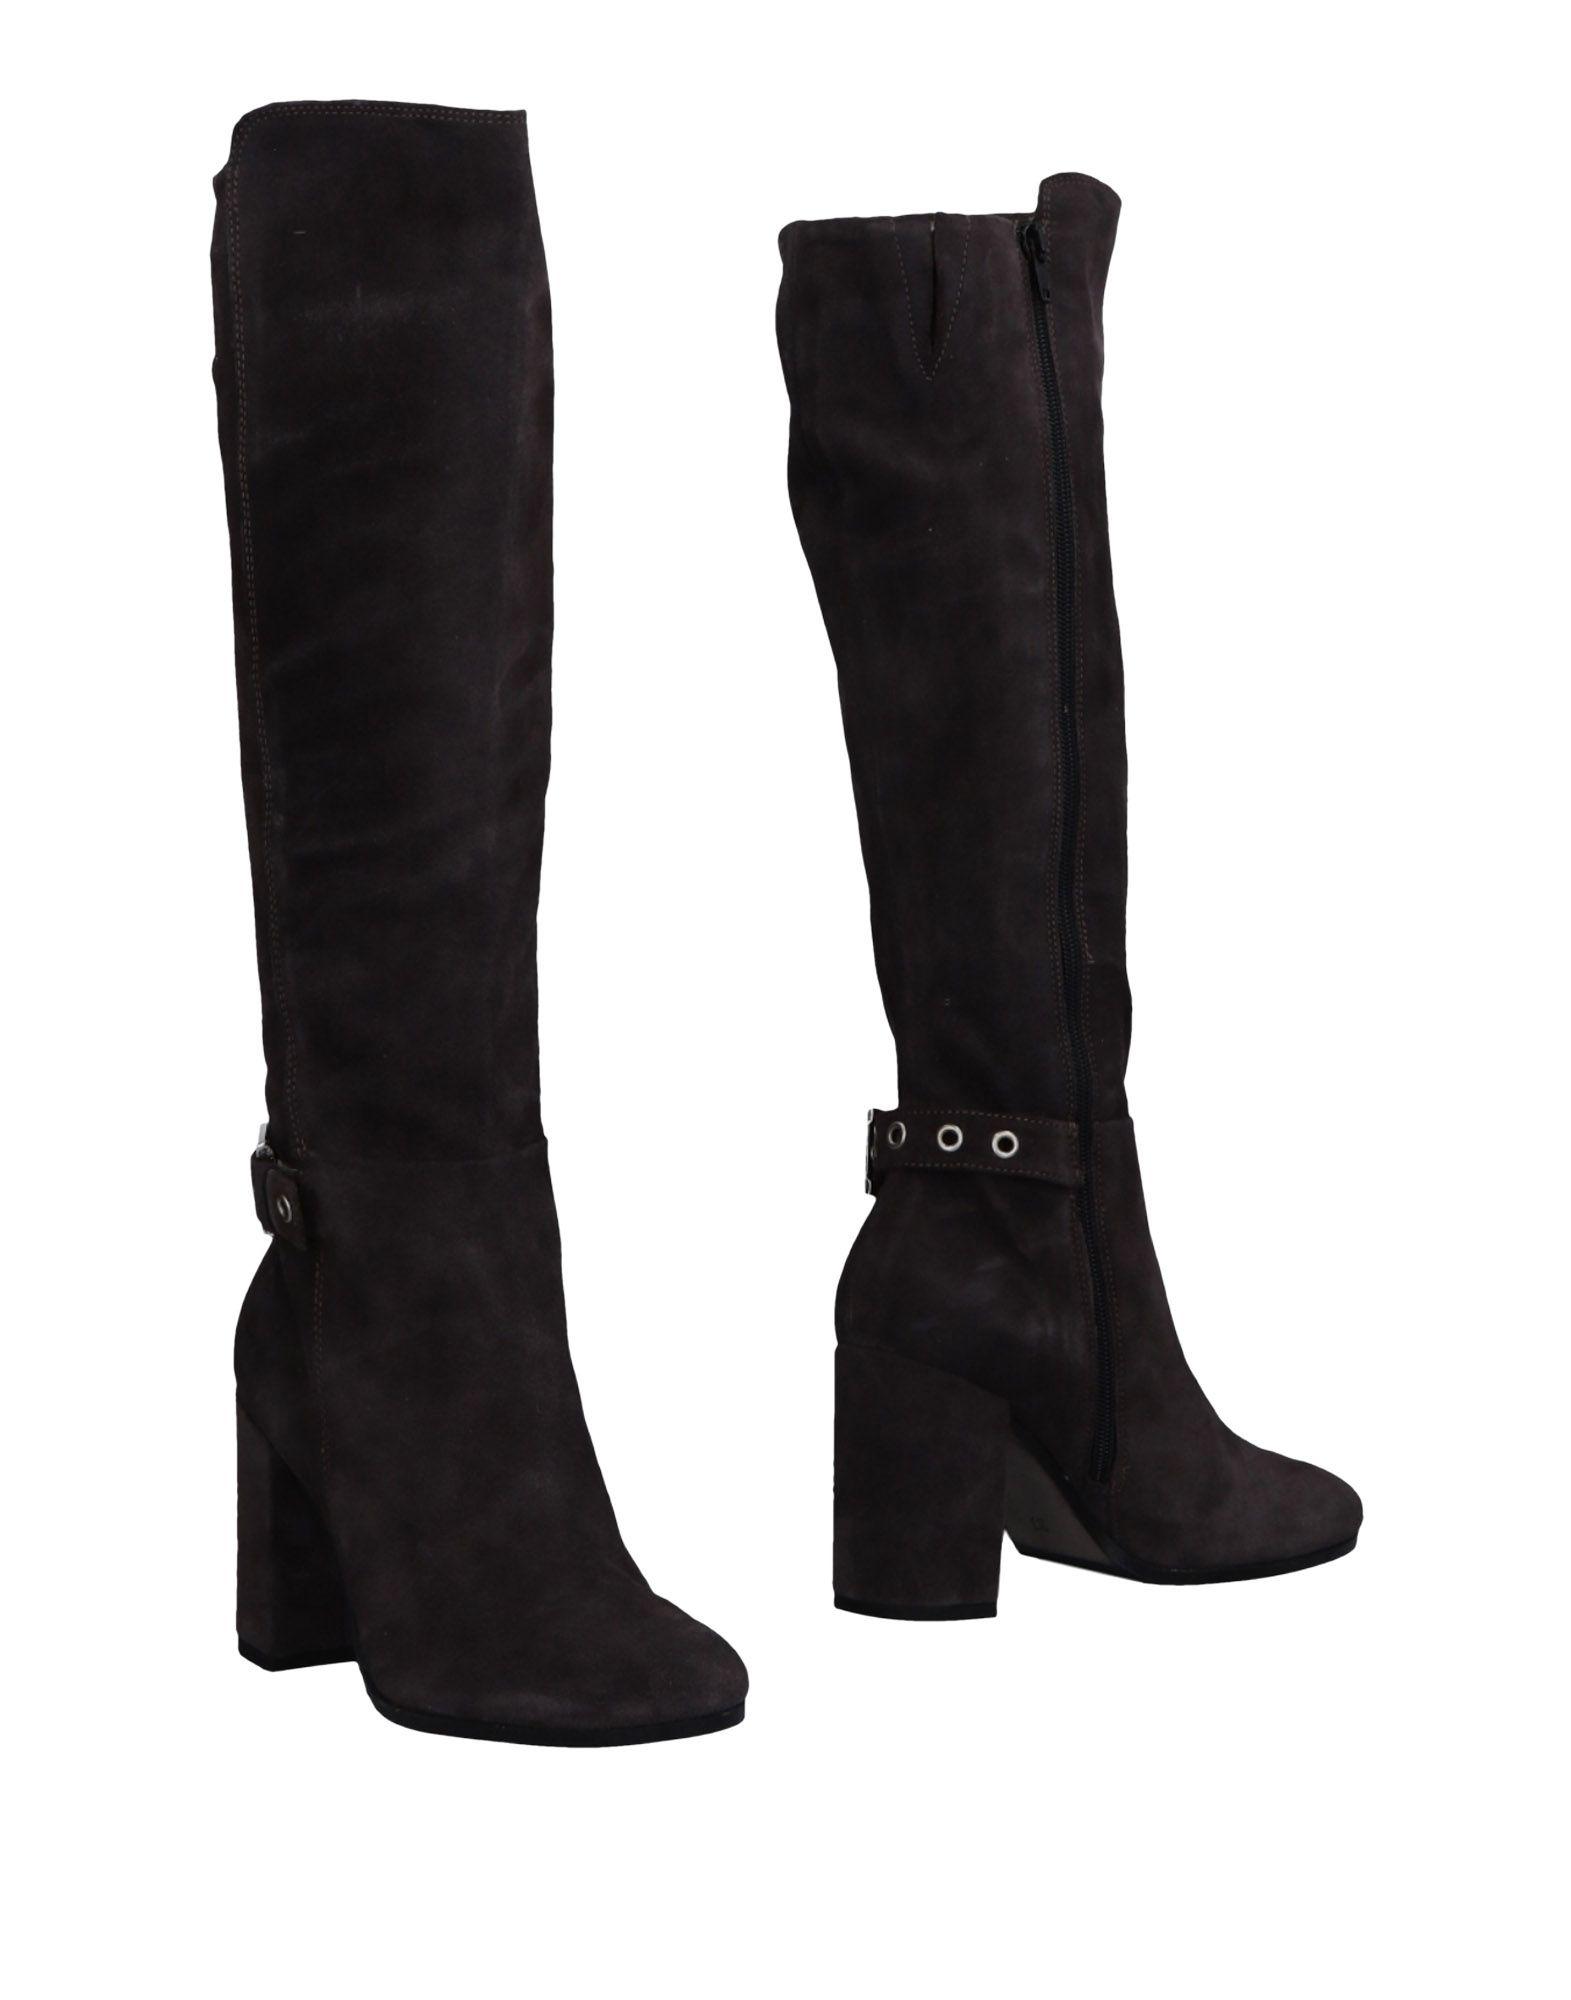 Paola 11475767UOGut Ferri Stiefel Damen  11475767UOGut Paola aussehende strapazierfähige Schuhe 037c7d